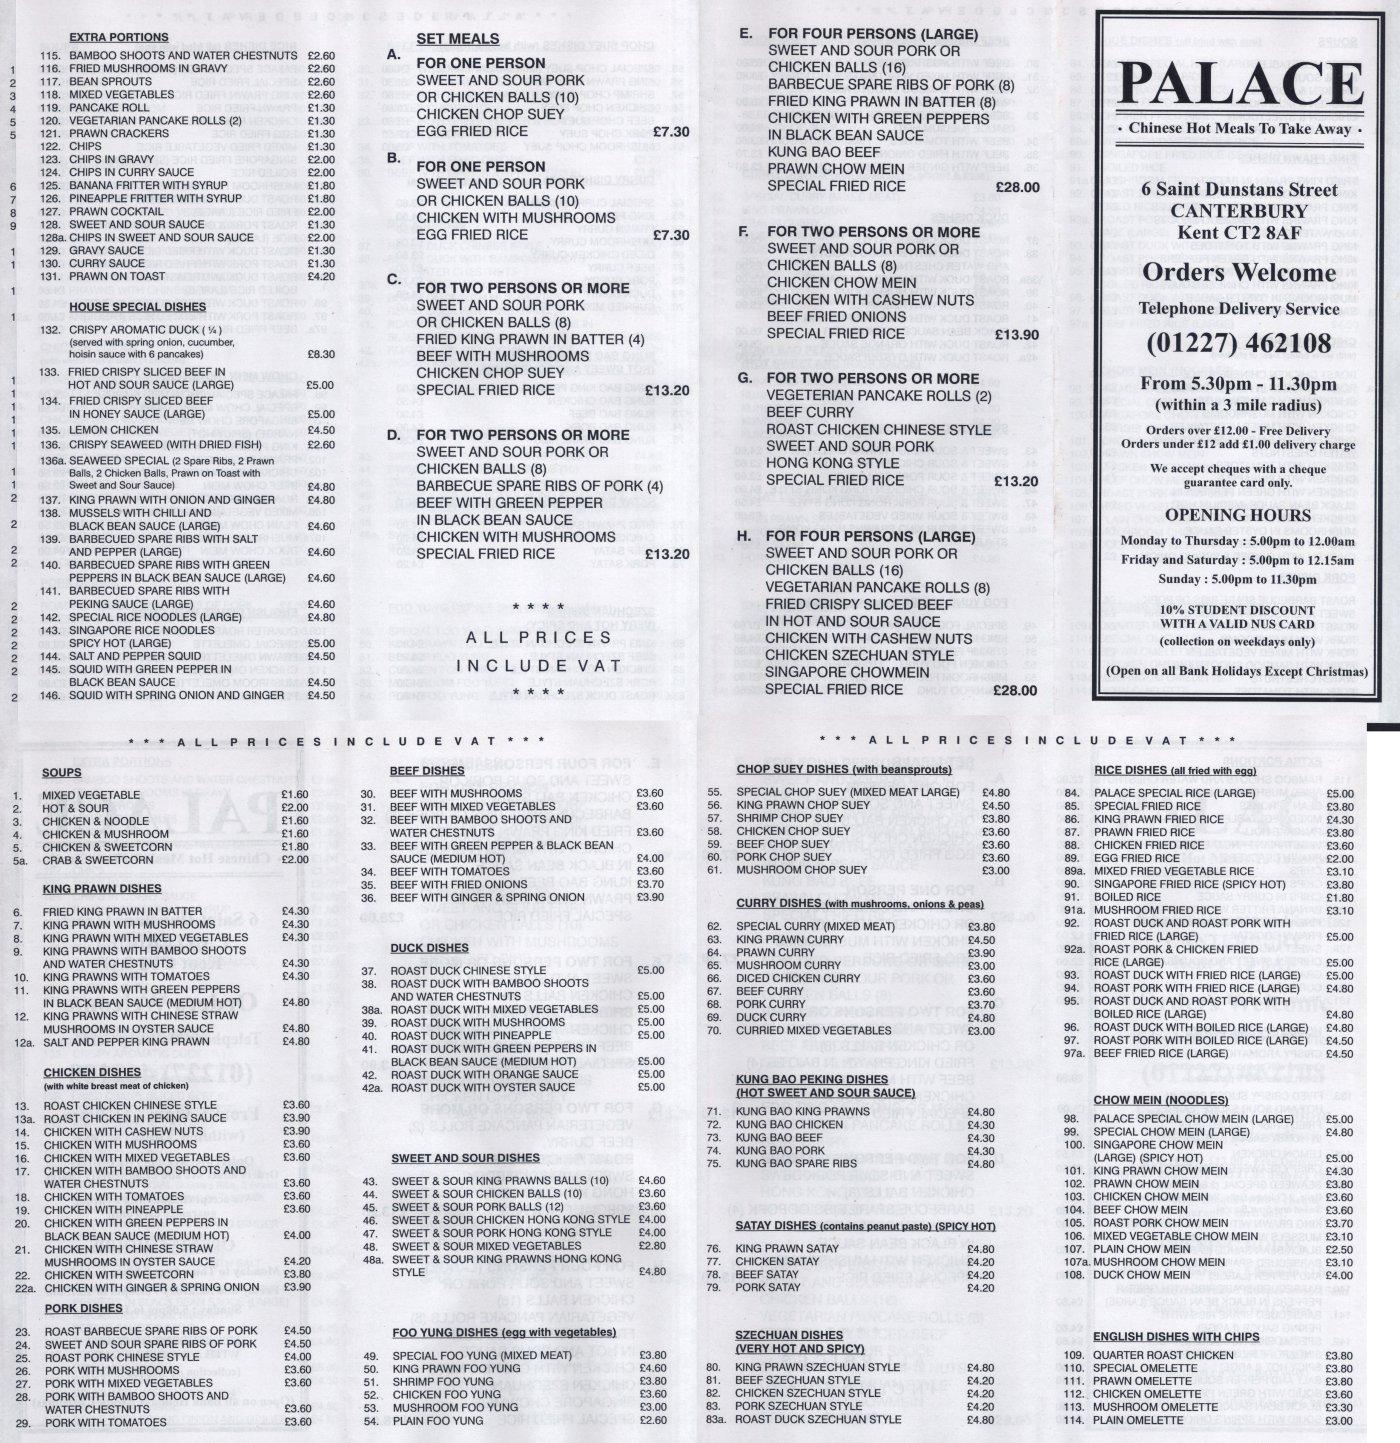 Magnificent Palace Kitchen Menu Model - Kitchen Cabinets | Ideas ...